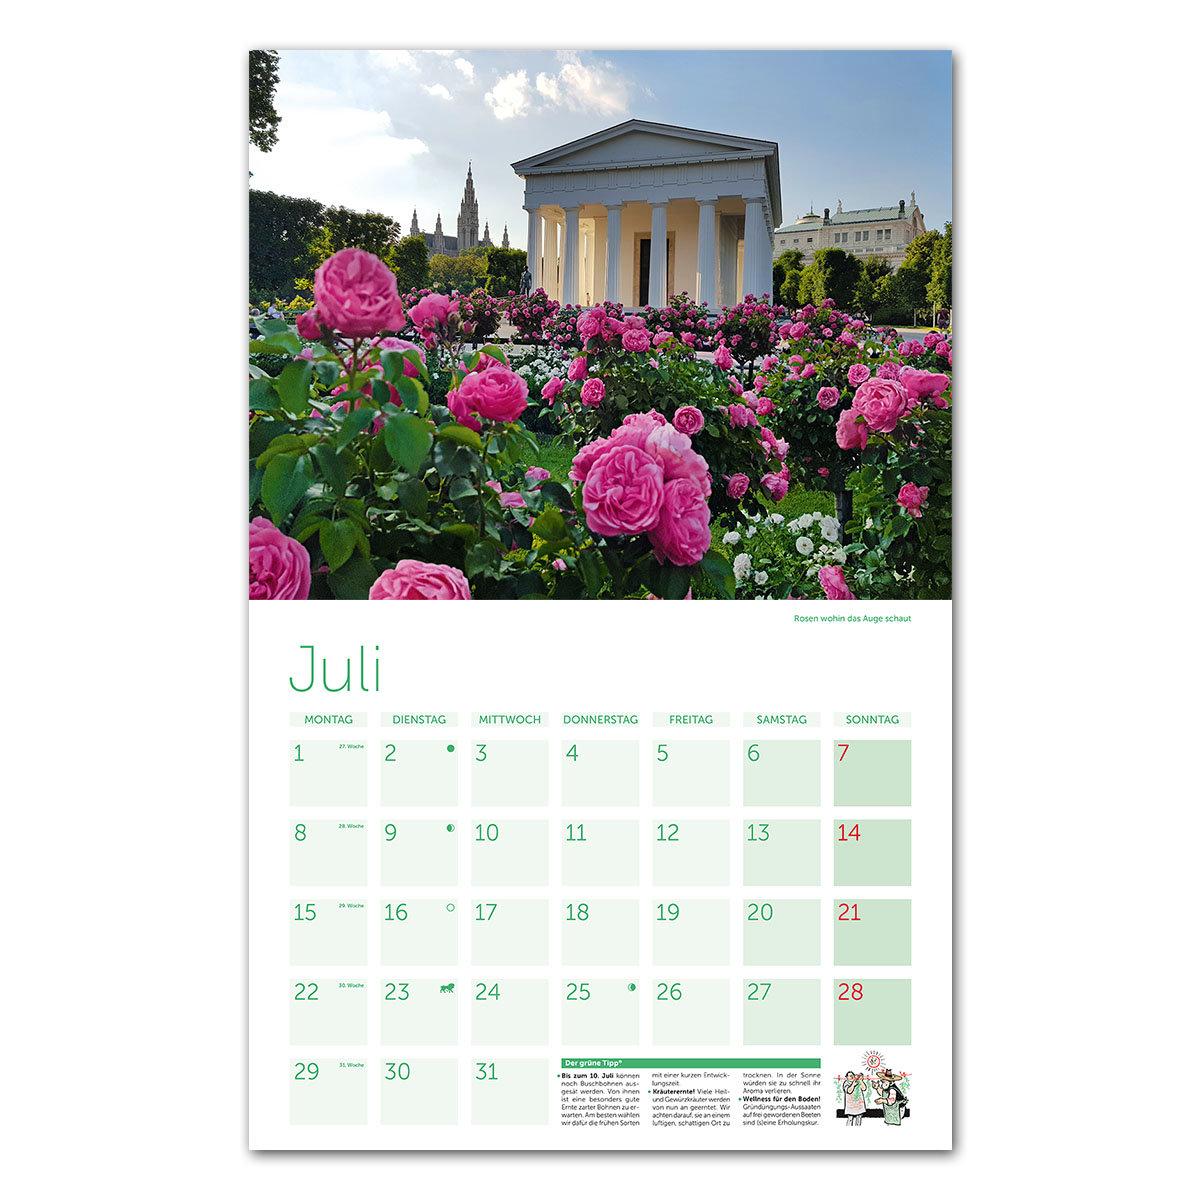 g rtner p tschkes maxi kalender online kaufen bei g rtner. Black Bedroom Furniture Sets. Home Design Ideas